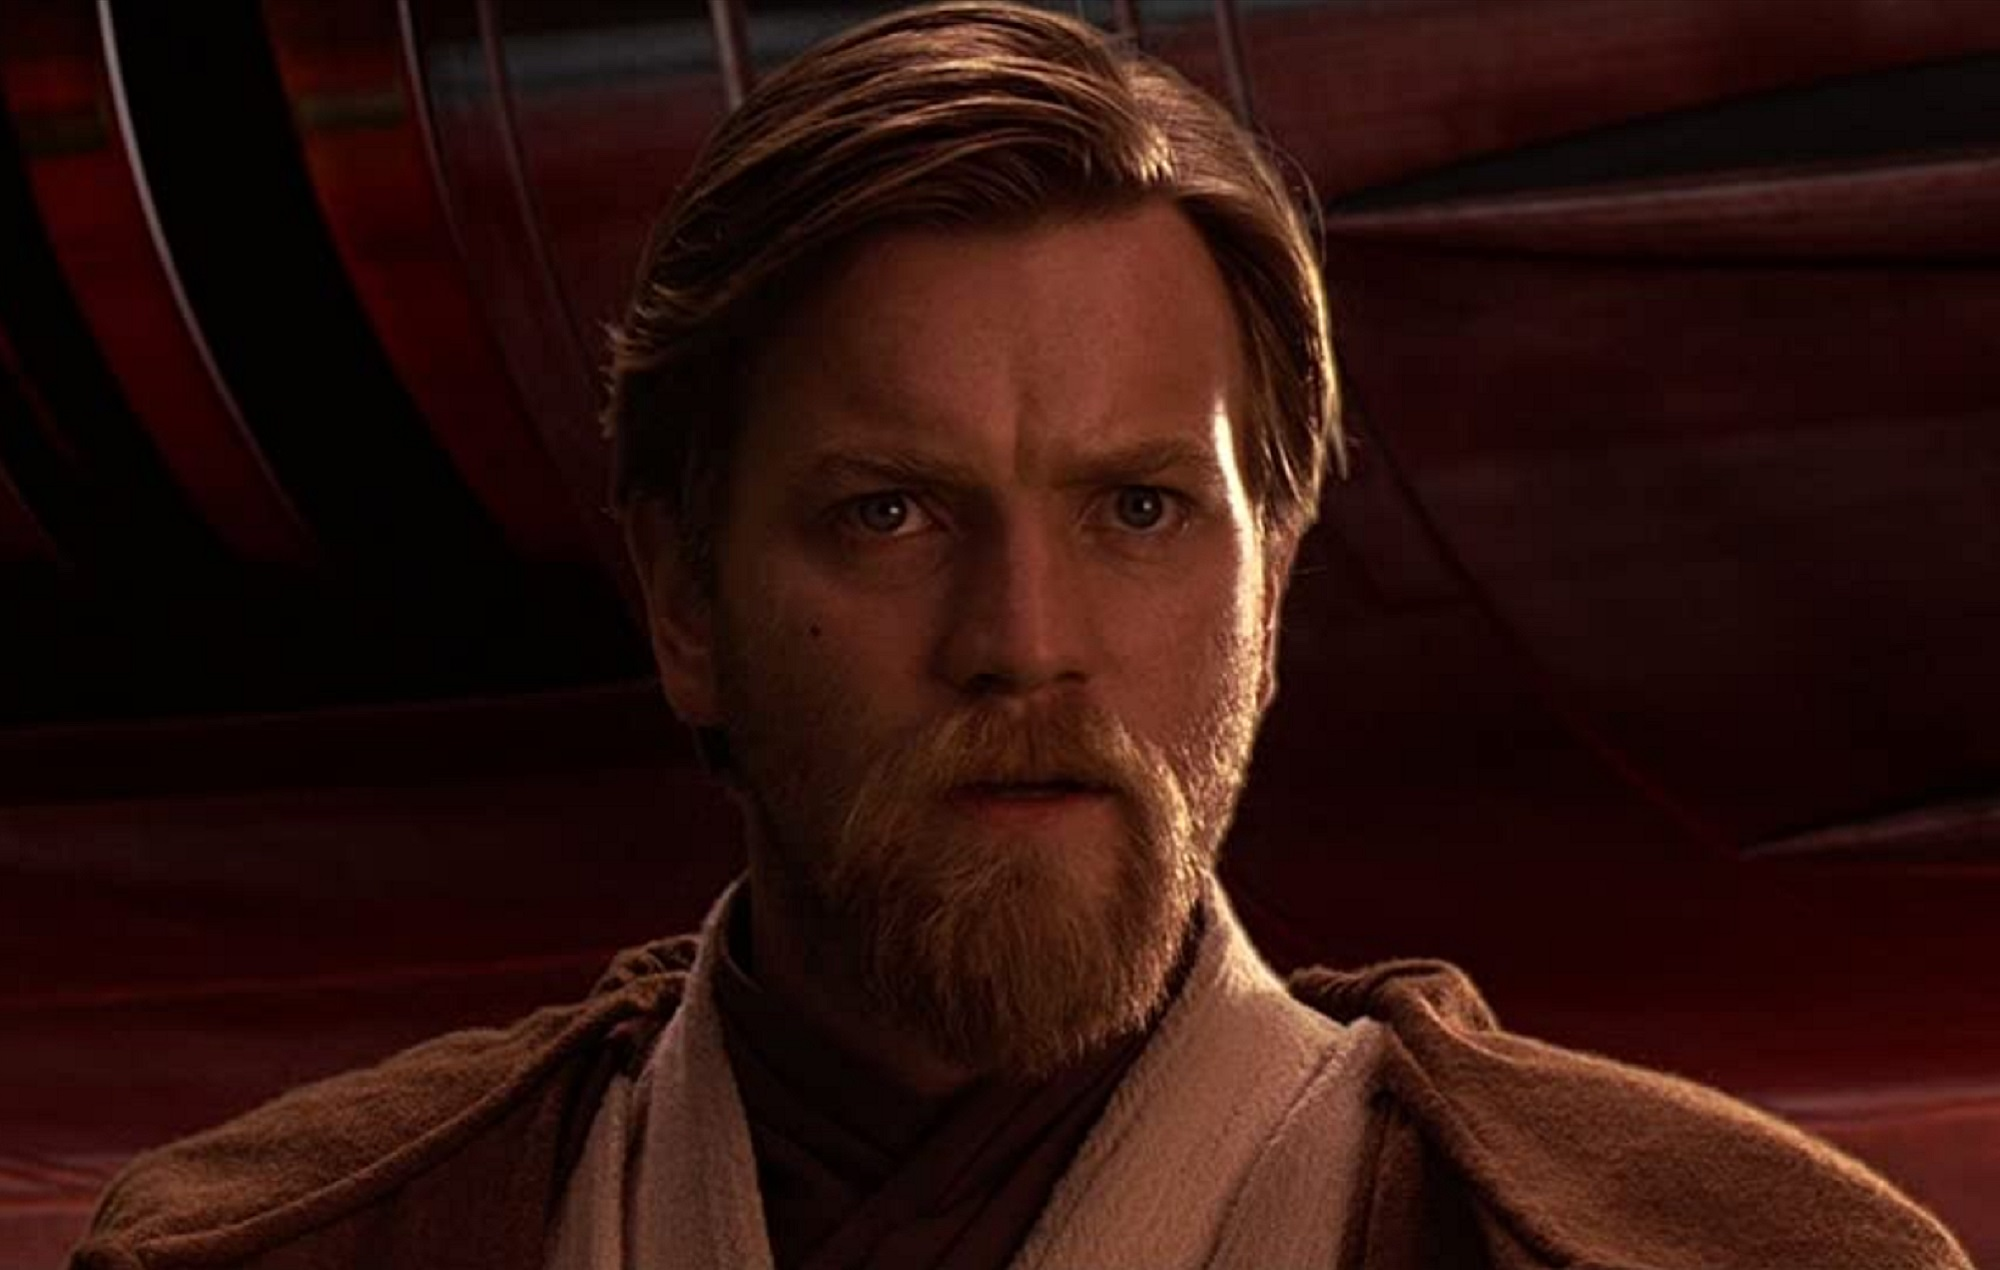 Ewan McGregor Kenobi Star Wars